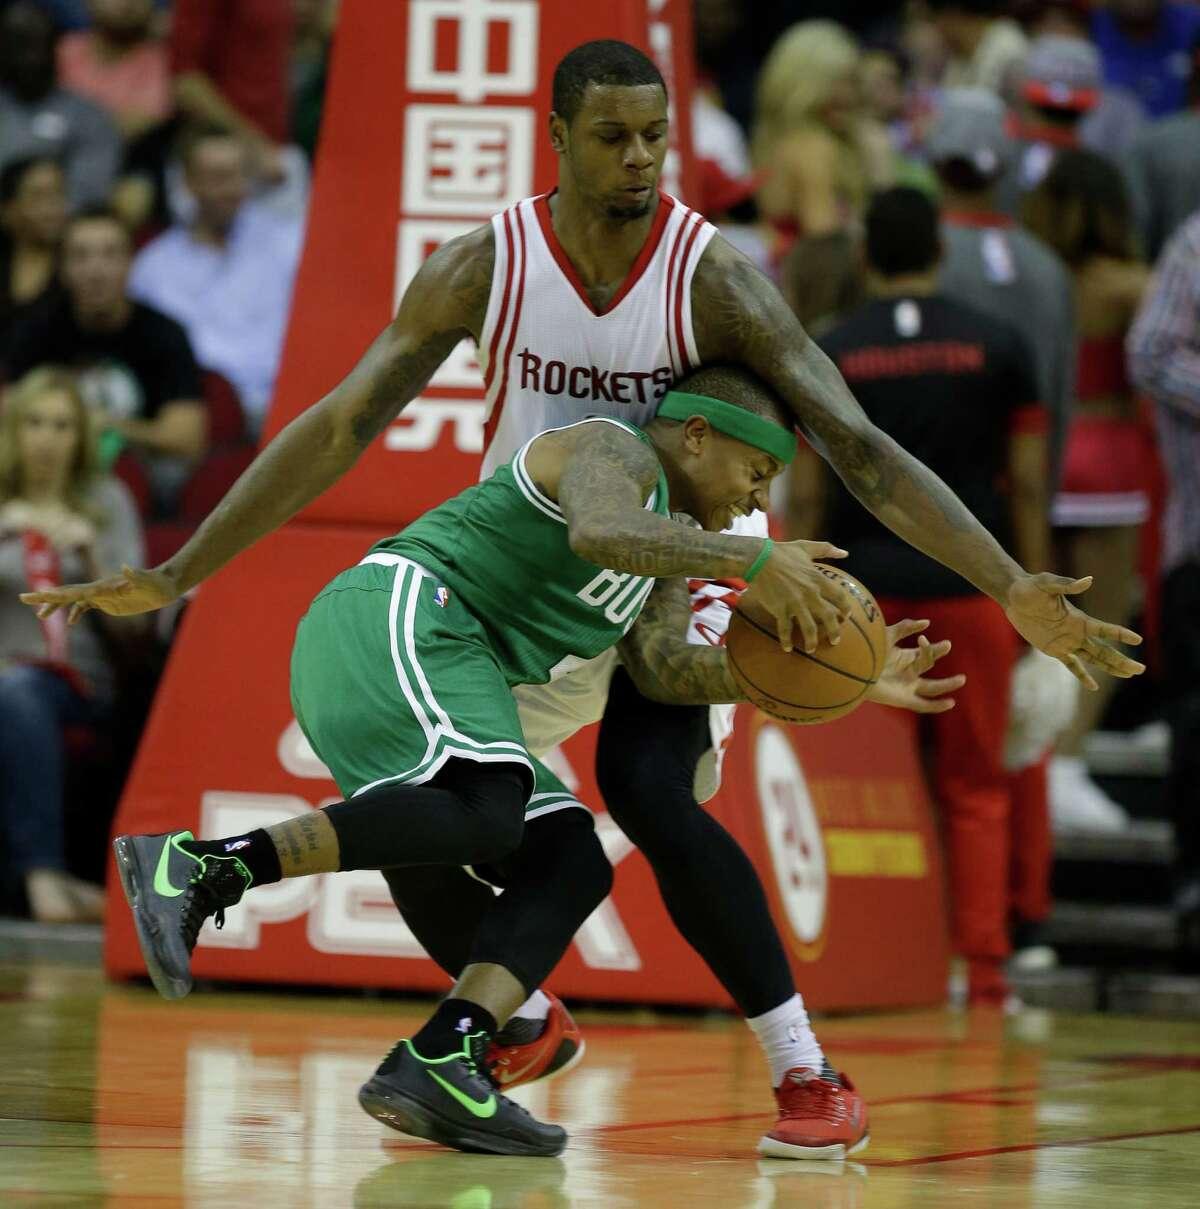 Houston Rockets Terrence Jones guards Boston Celtics Isaiah Thomas during the second half of NBA game at Toyota Center Monday, Nov. 16, 2015, in Houston. ( Melissa Phillip / Houston Chronicle )